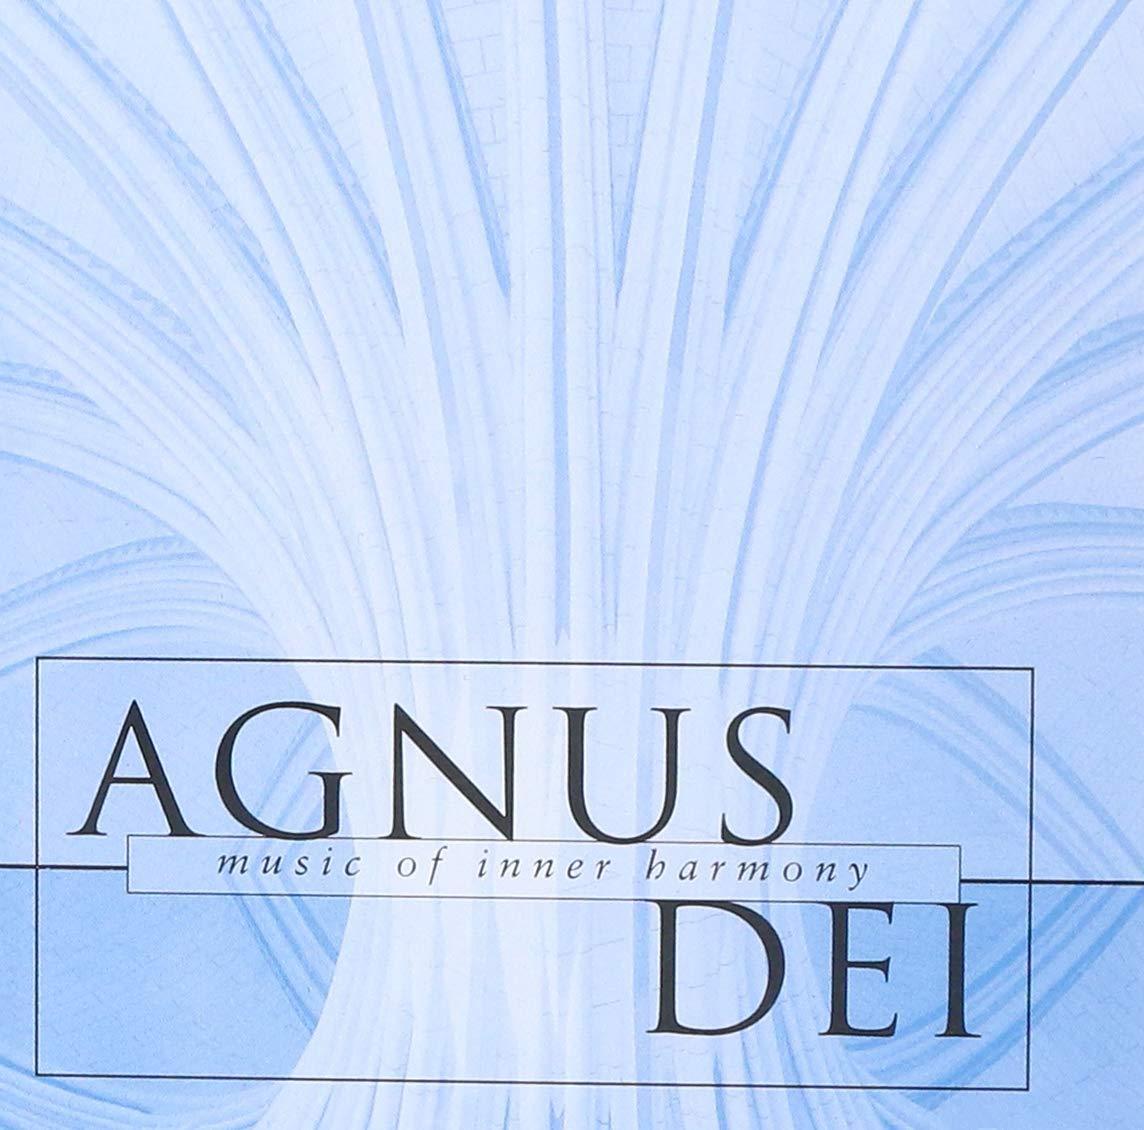 Agnus Dei: Music of Inner Harmony